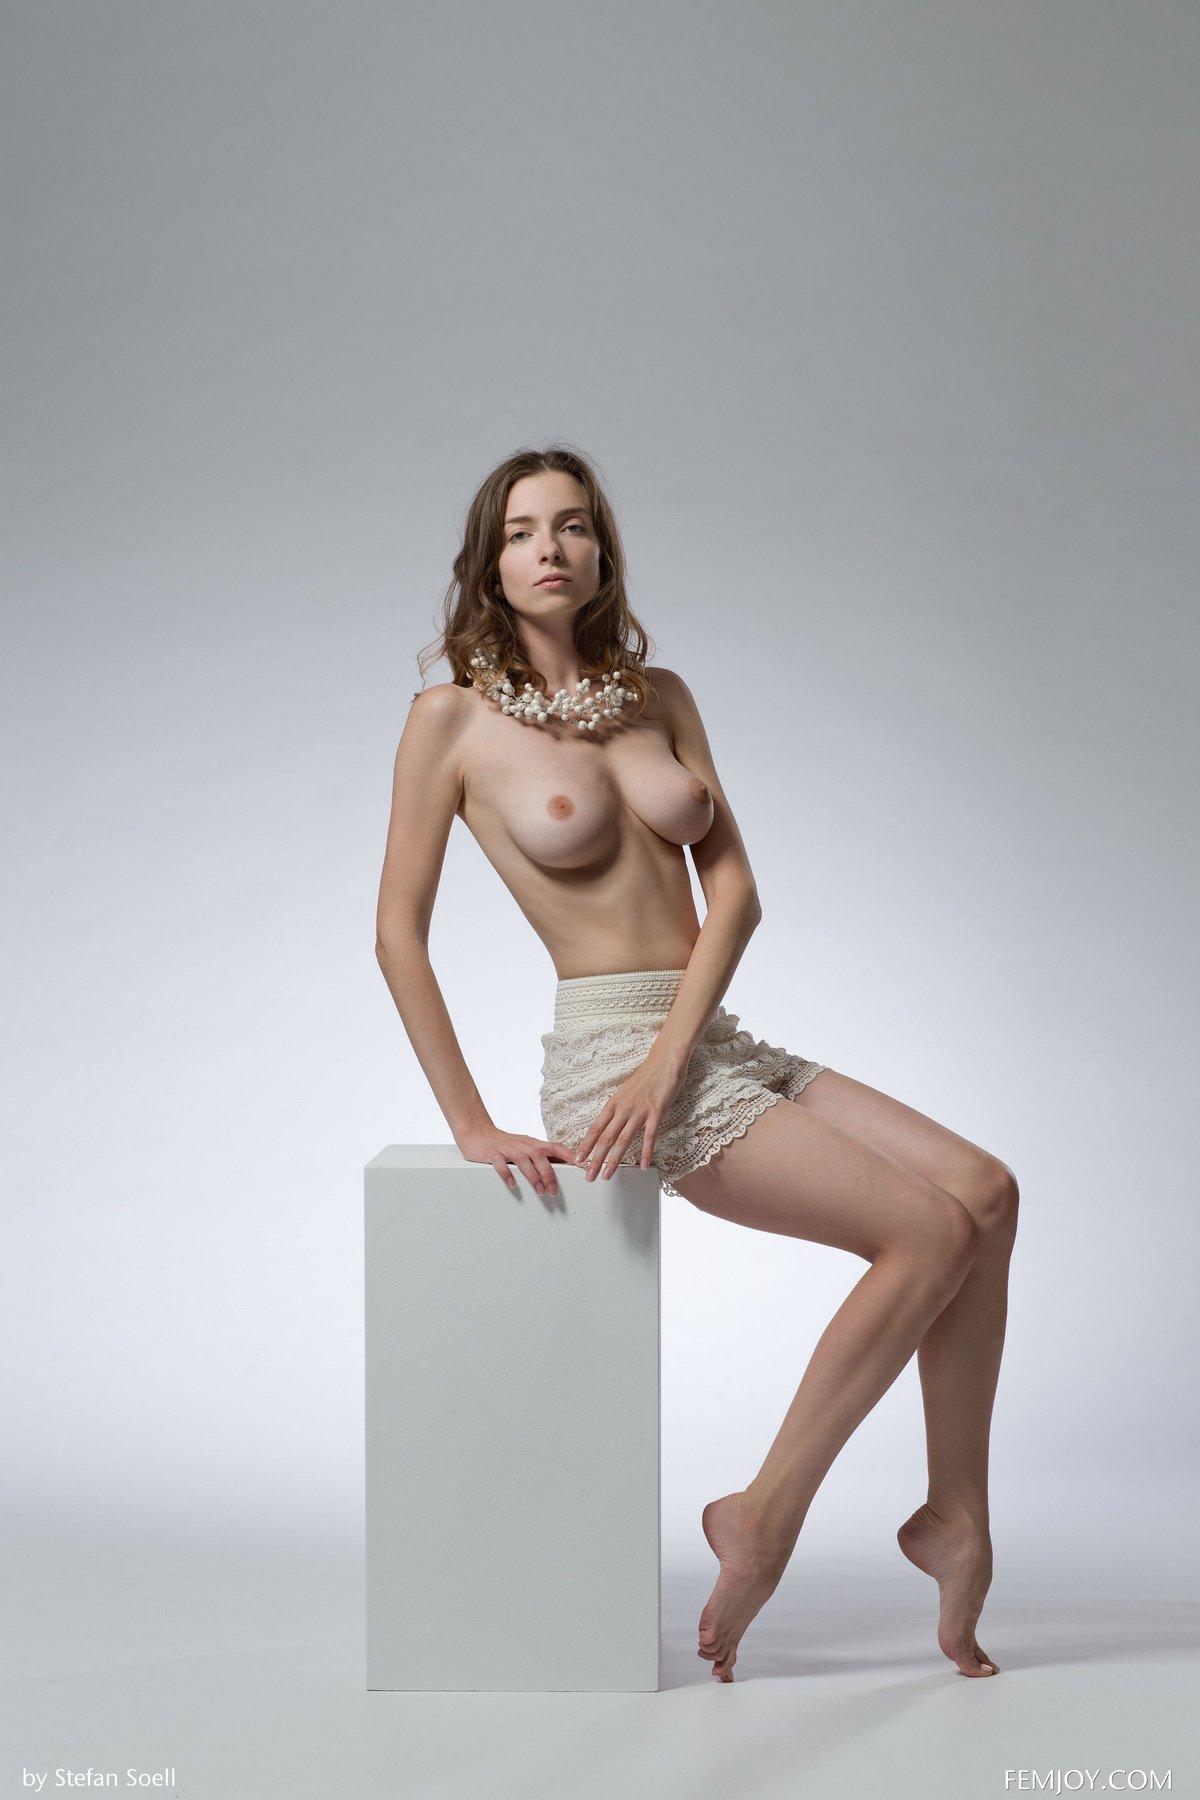 kuba-devushki-erotika-foto-styuardessa-soset-u-bogatogo